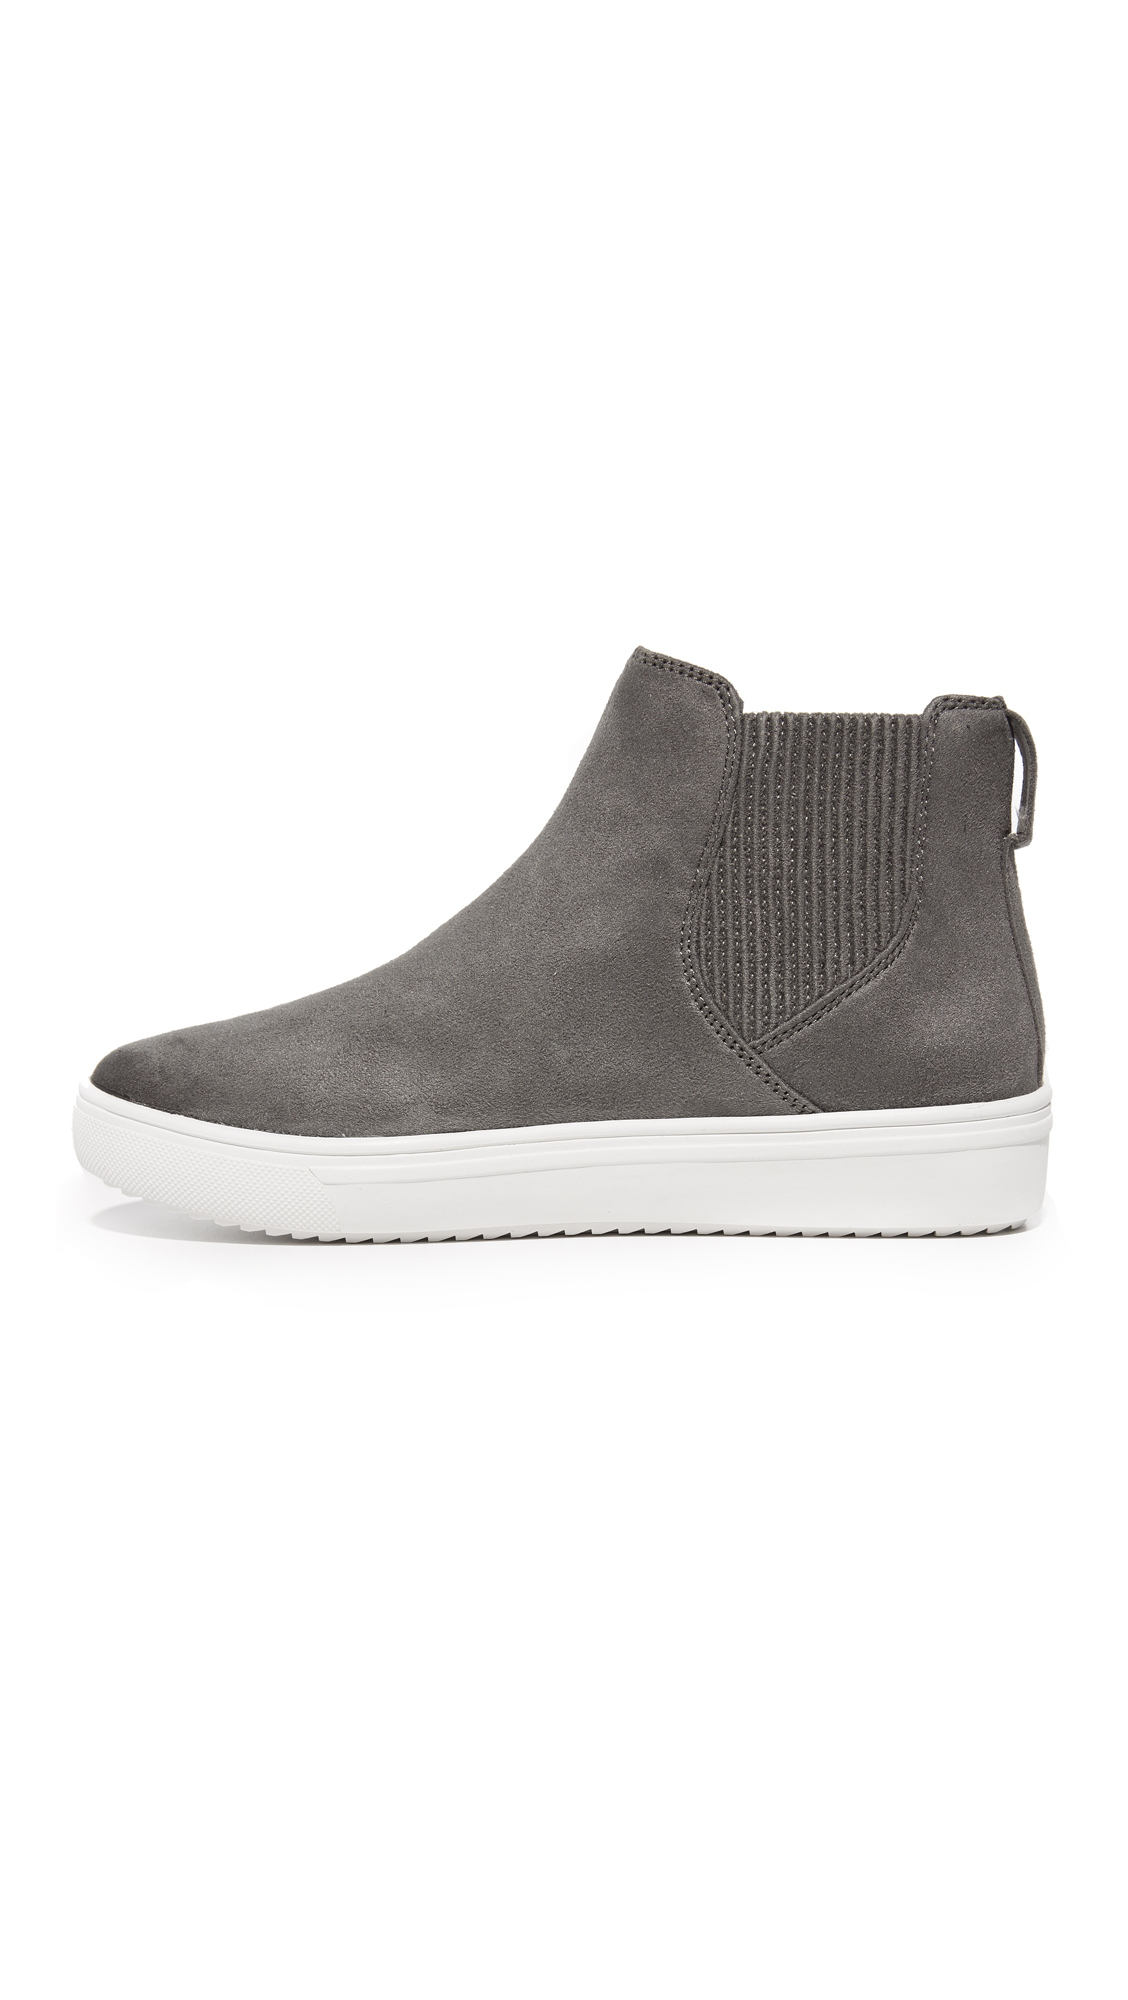 f972608fa56 Steven Coal Platform Chelsea Sneakers